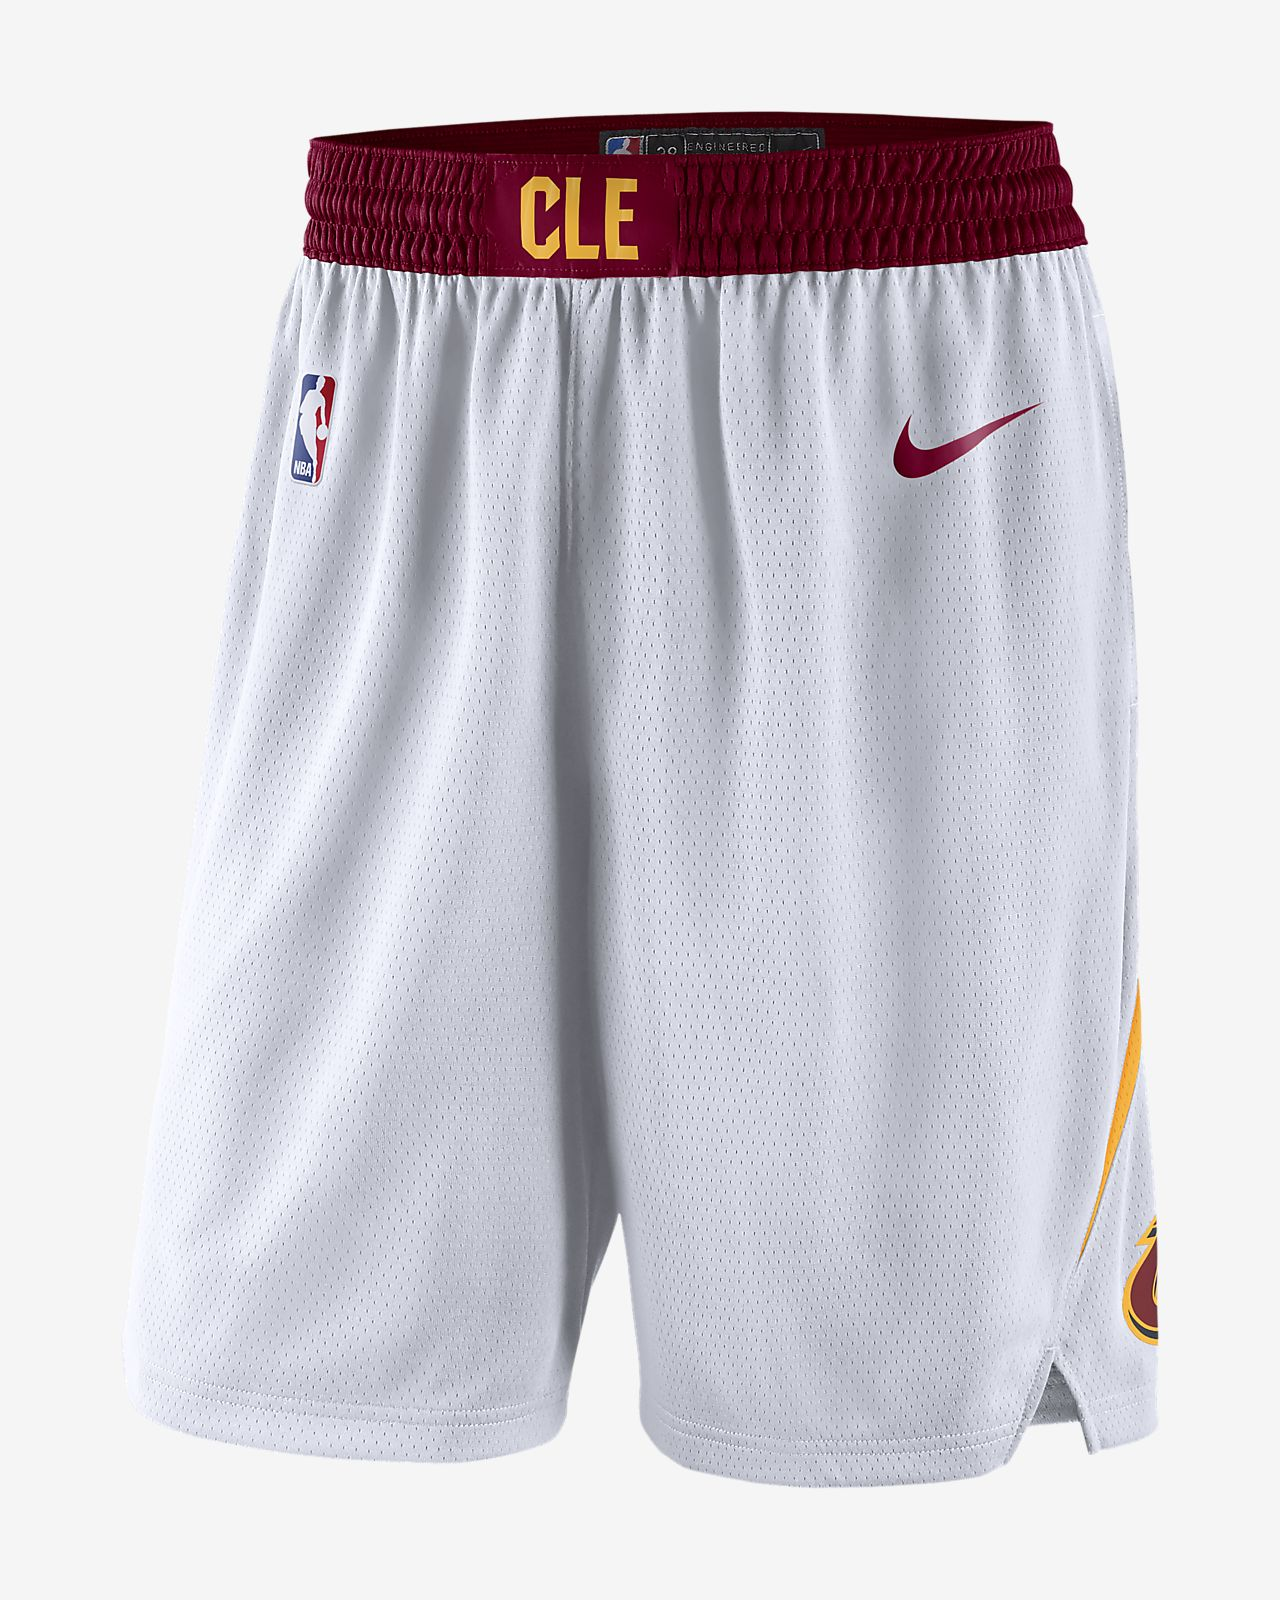 Cleveland Cavaliers Association Edition Swingman Men's Nike NBA Shorts